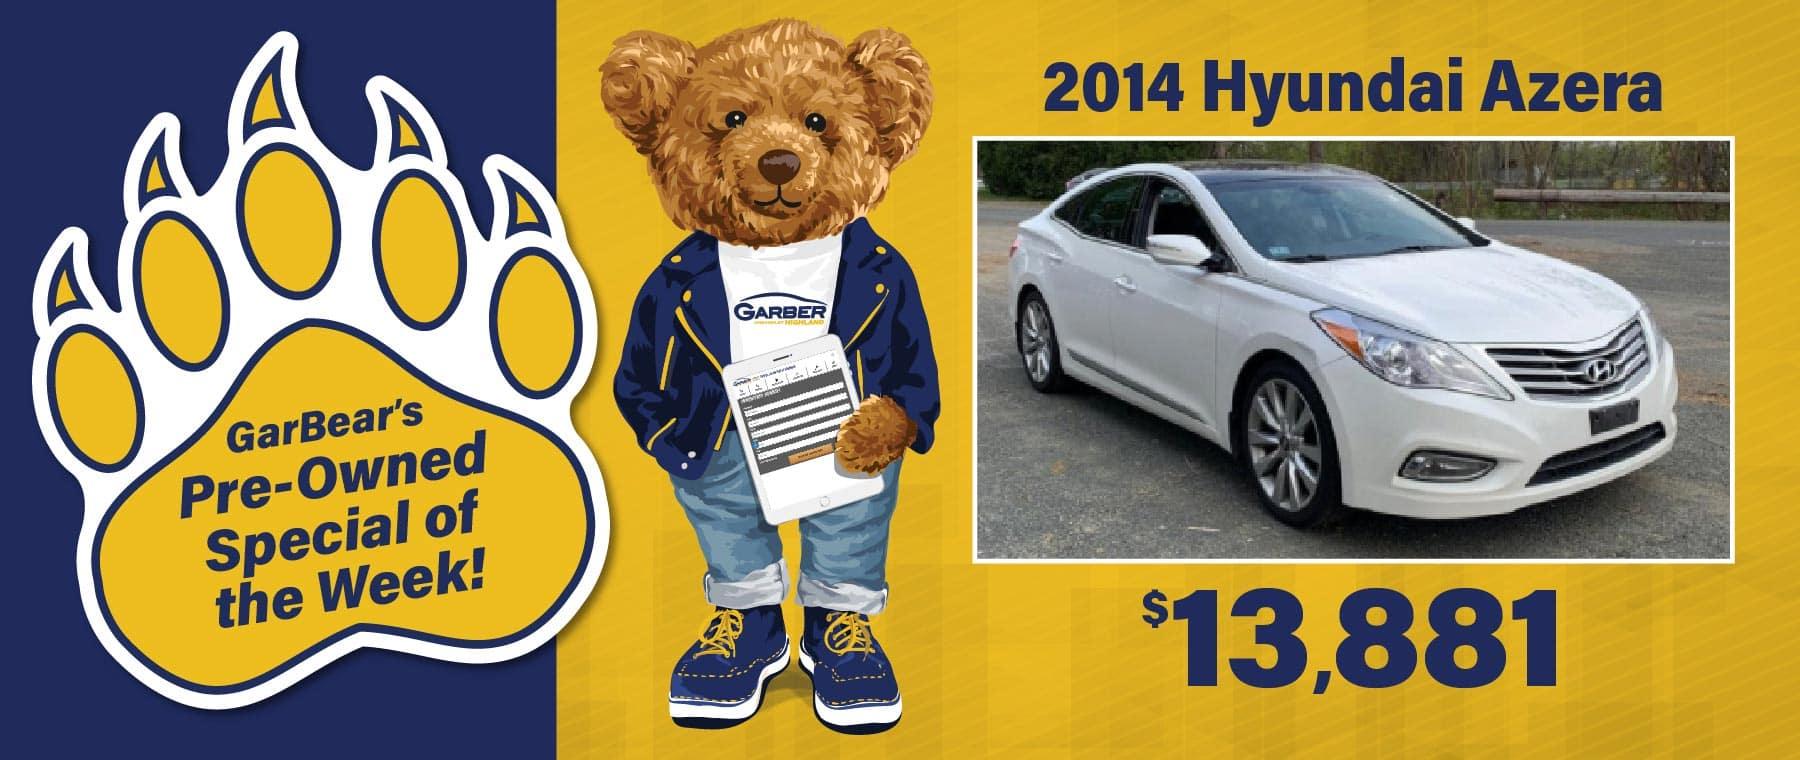 2014 Hyundai Azera $13,881